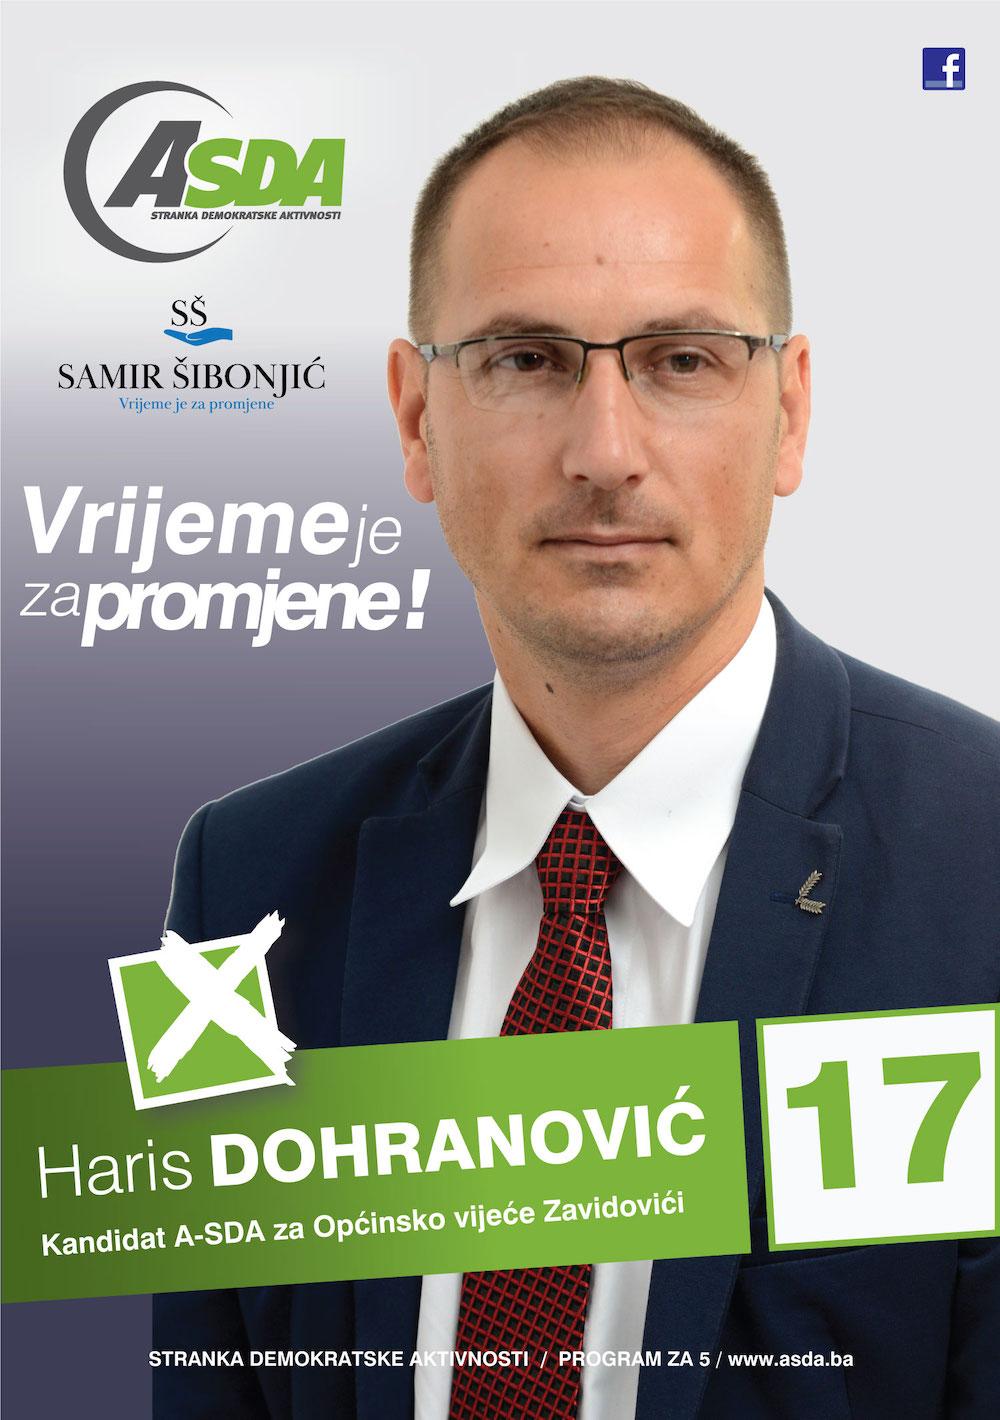 Haris Dohranović